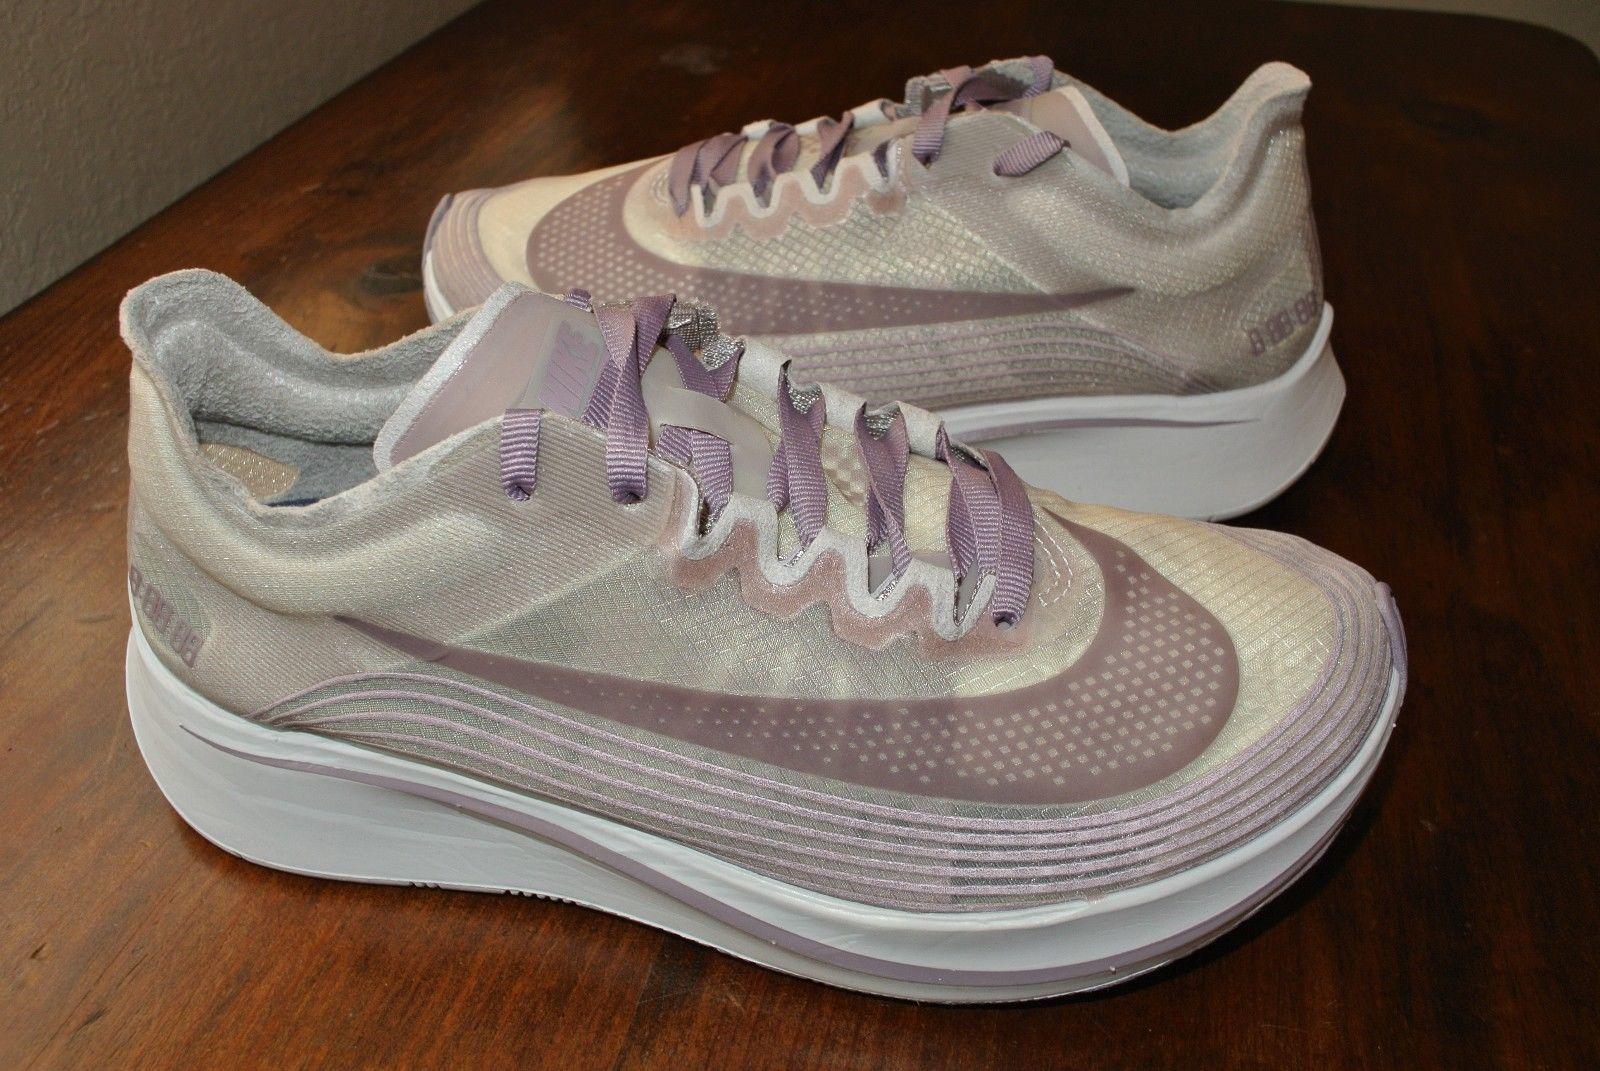 01147c5b148d Nike Nike Lab Zoom Fly Sp Chicago Marathon and 50 similar items. 57